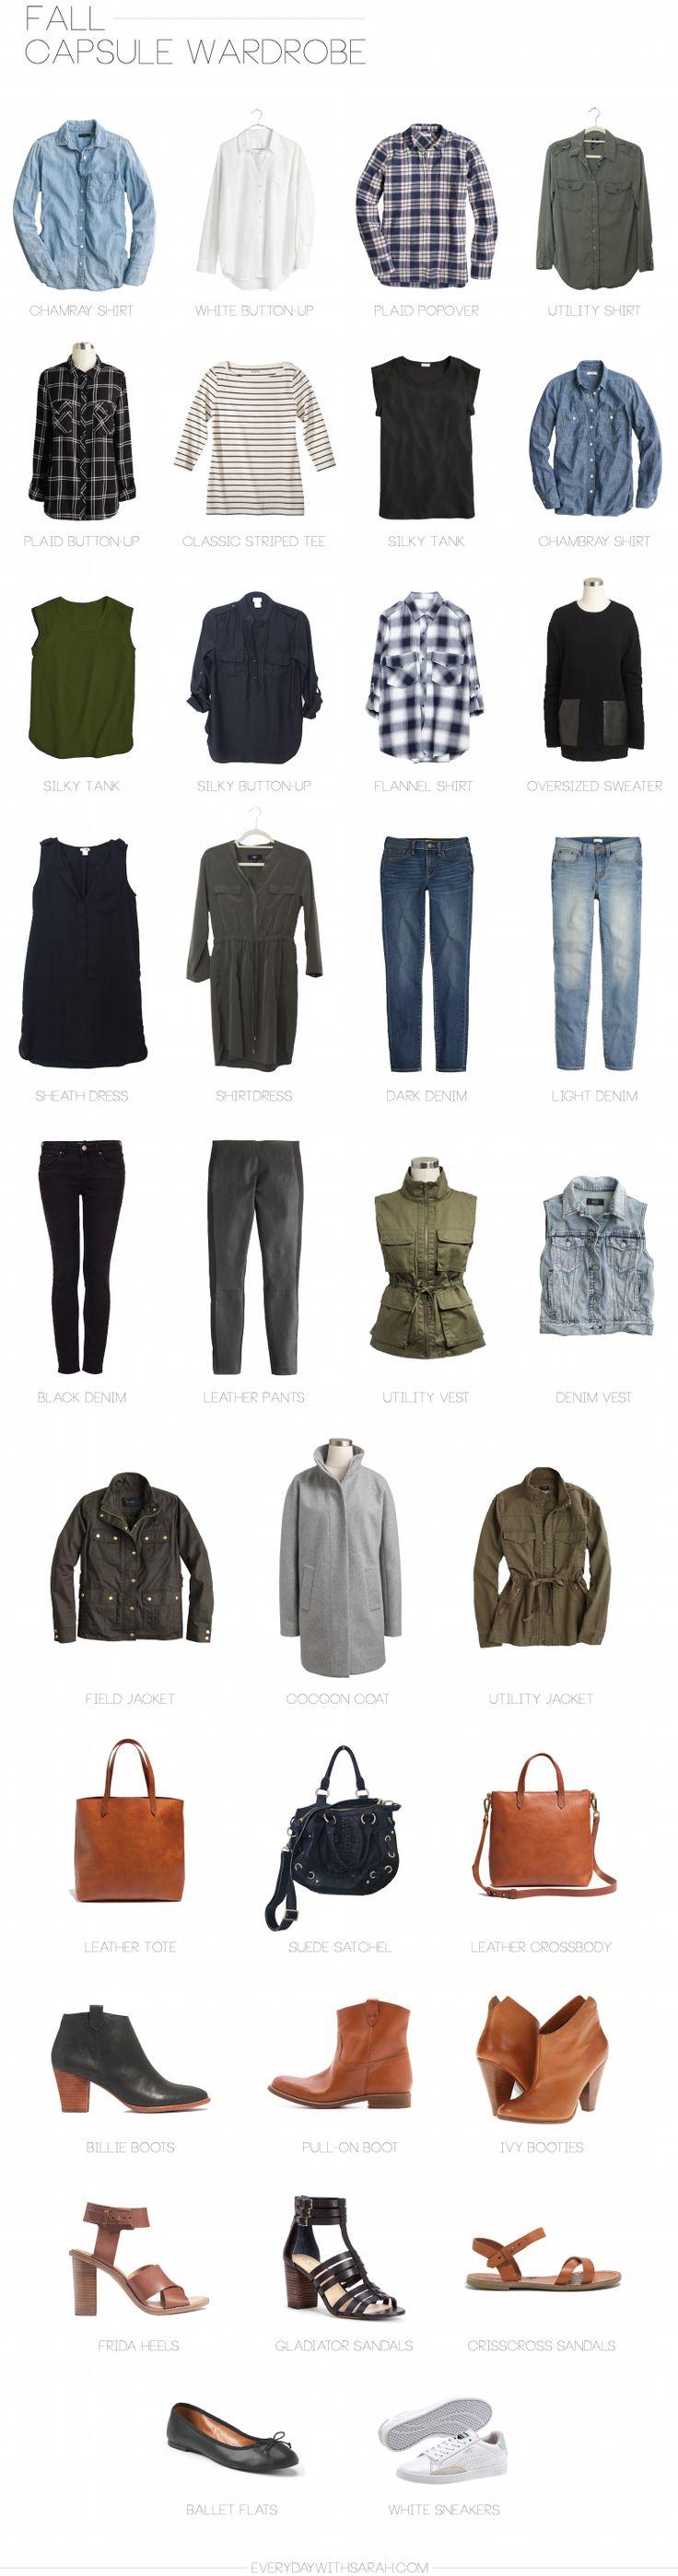 best 25 fall capsule ideas on pinterest fall capsule wardrobe